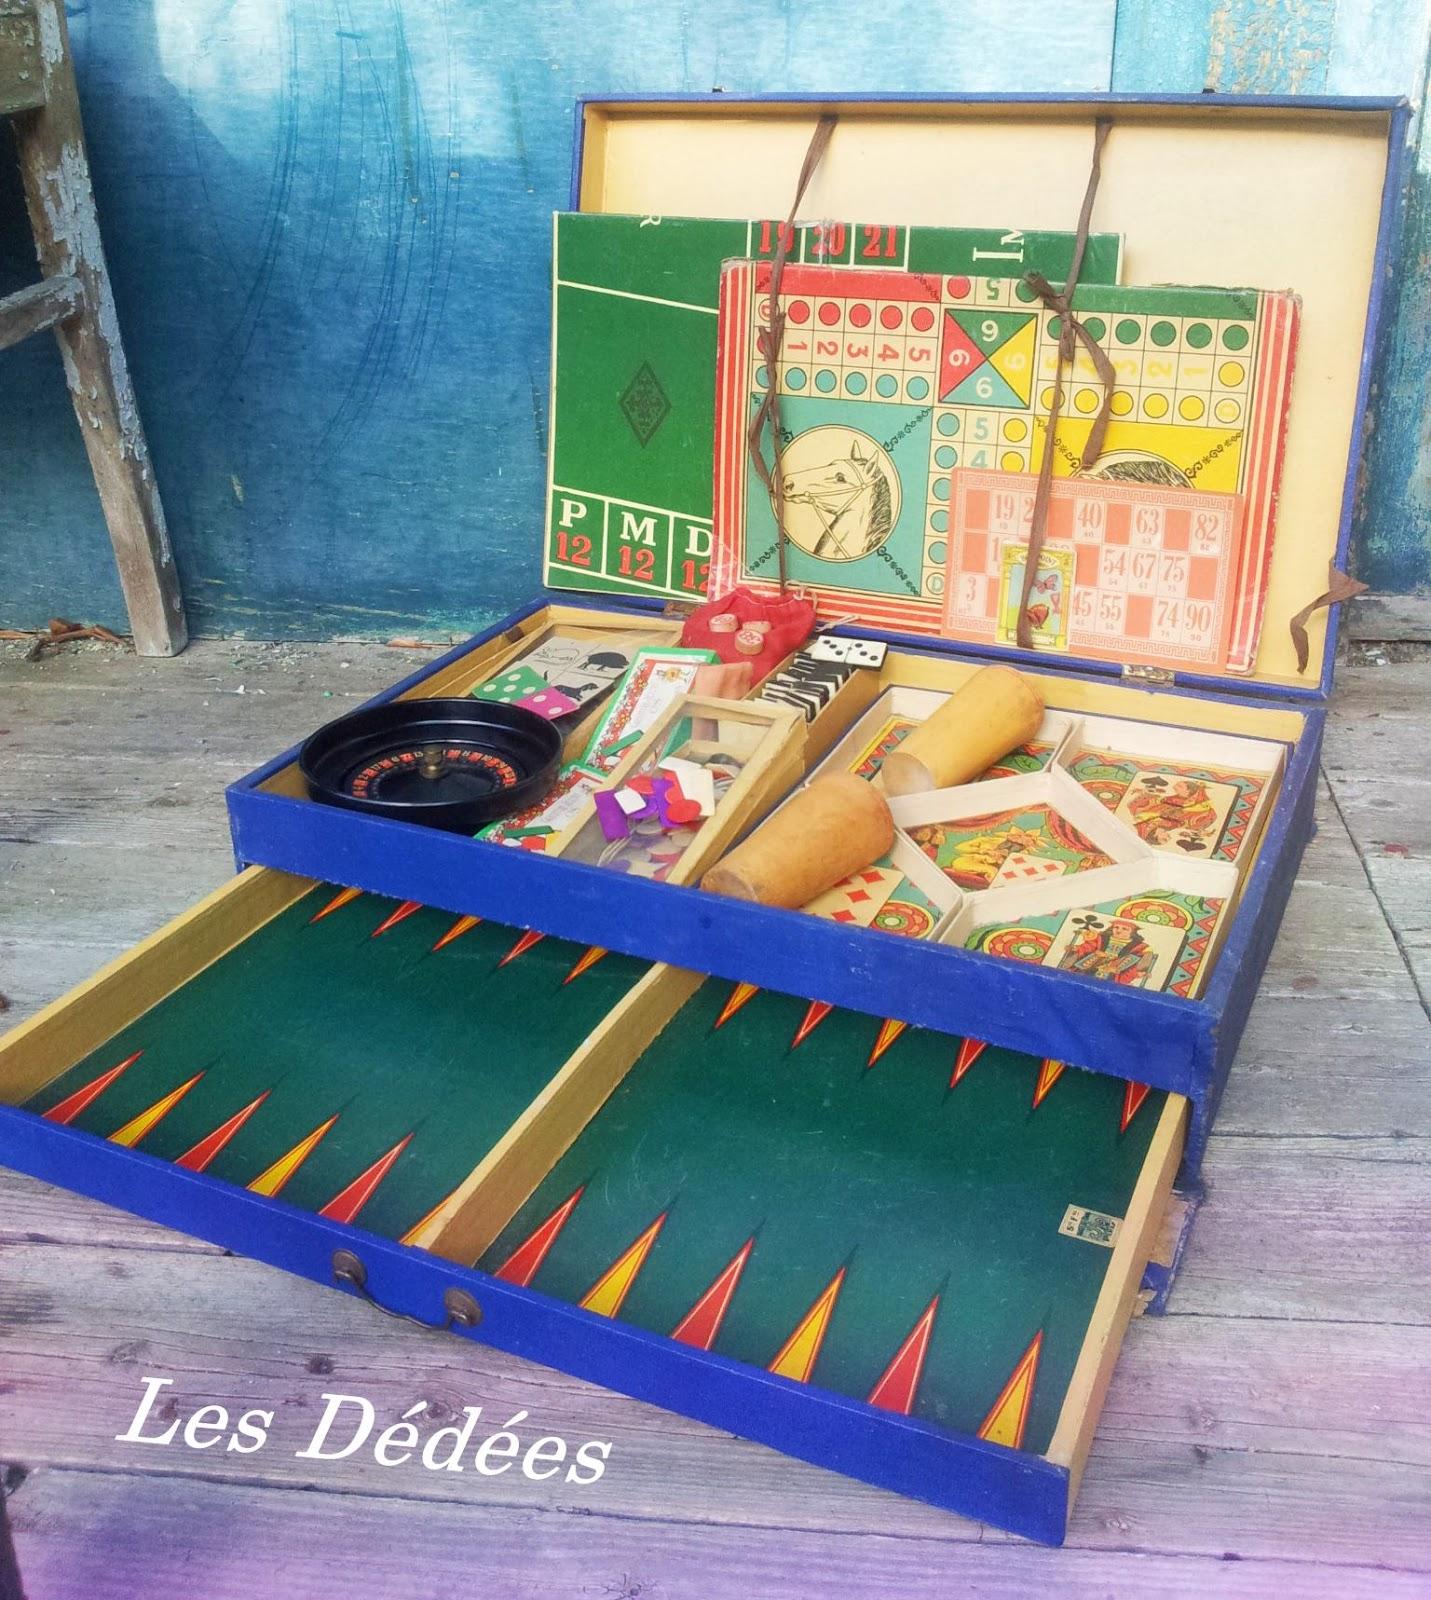 jeu de roulette malette. Black Bedroom Furniture Sets. Home Design Ideas